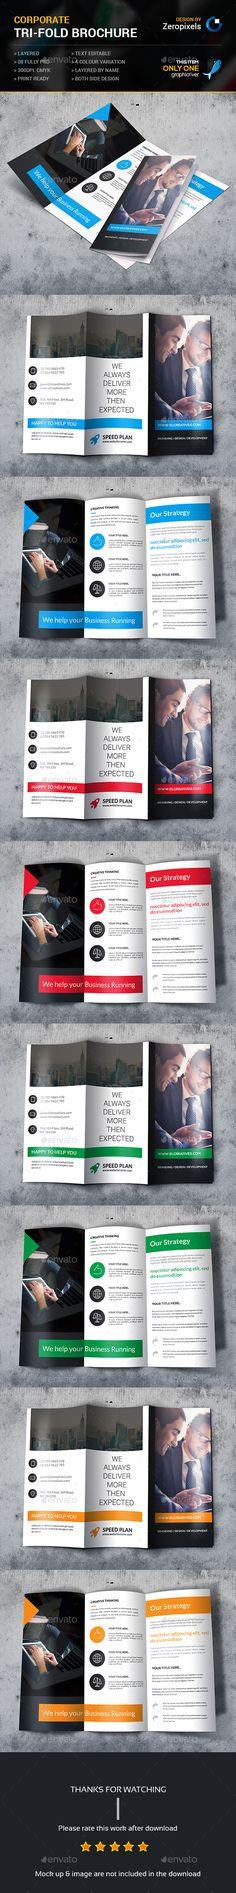 Corporate Business Tri-fold Brochure. Download http://graphicriver.net/item/corporate-business-trifold-brochure/15285562?ref=heavens786